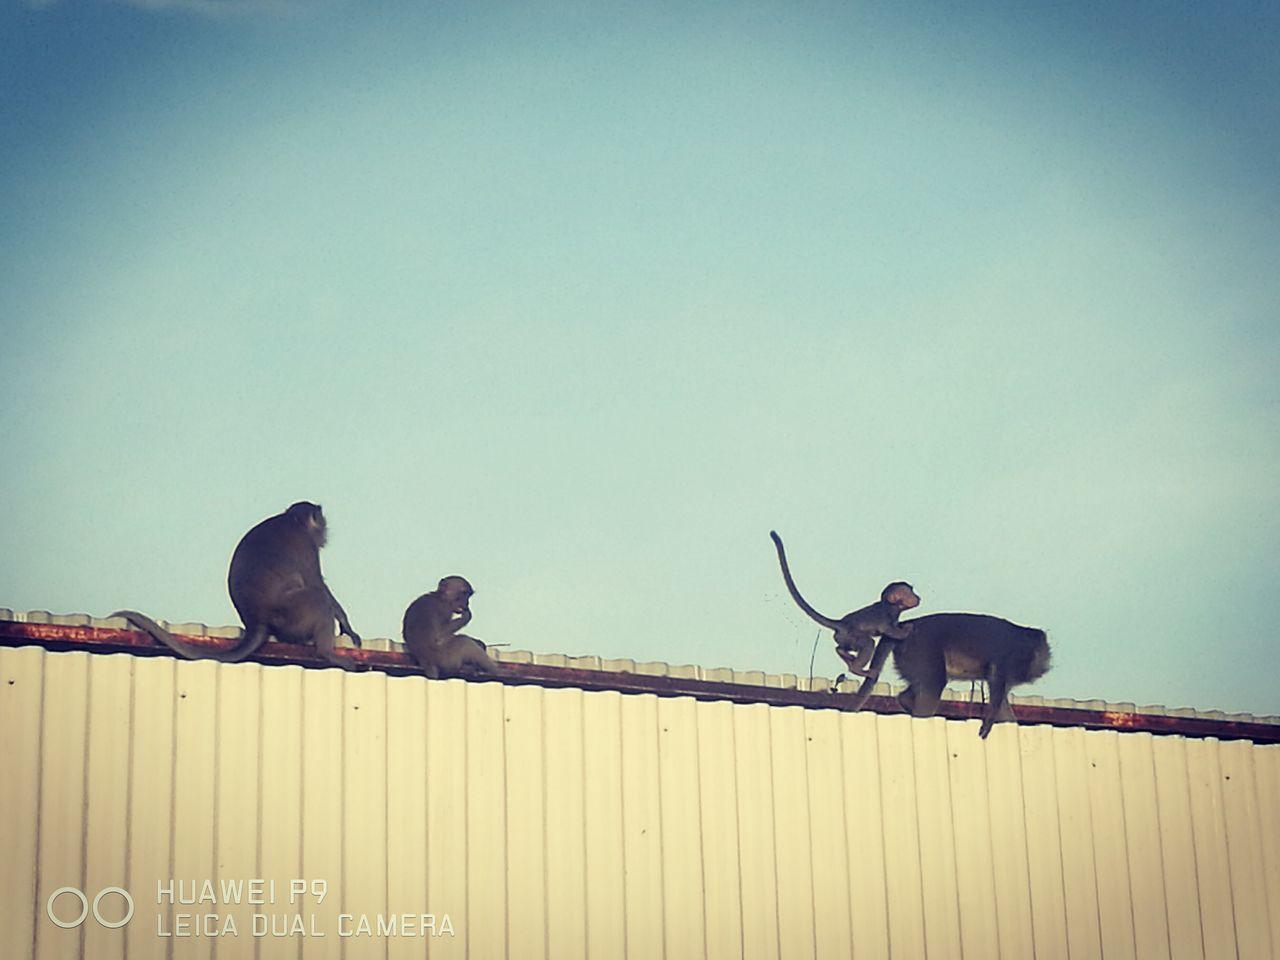 HuaweiP9 Huawei Monkeys Animal Family Relaxing